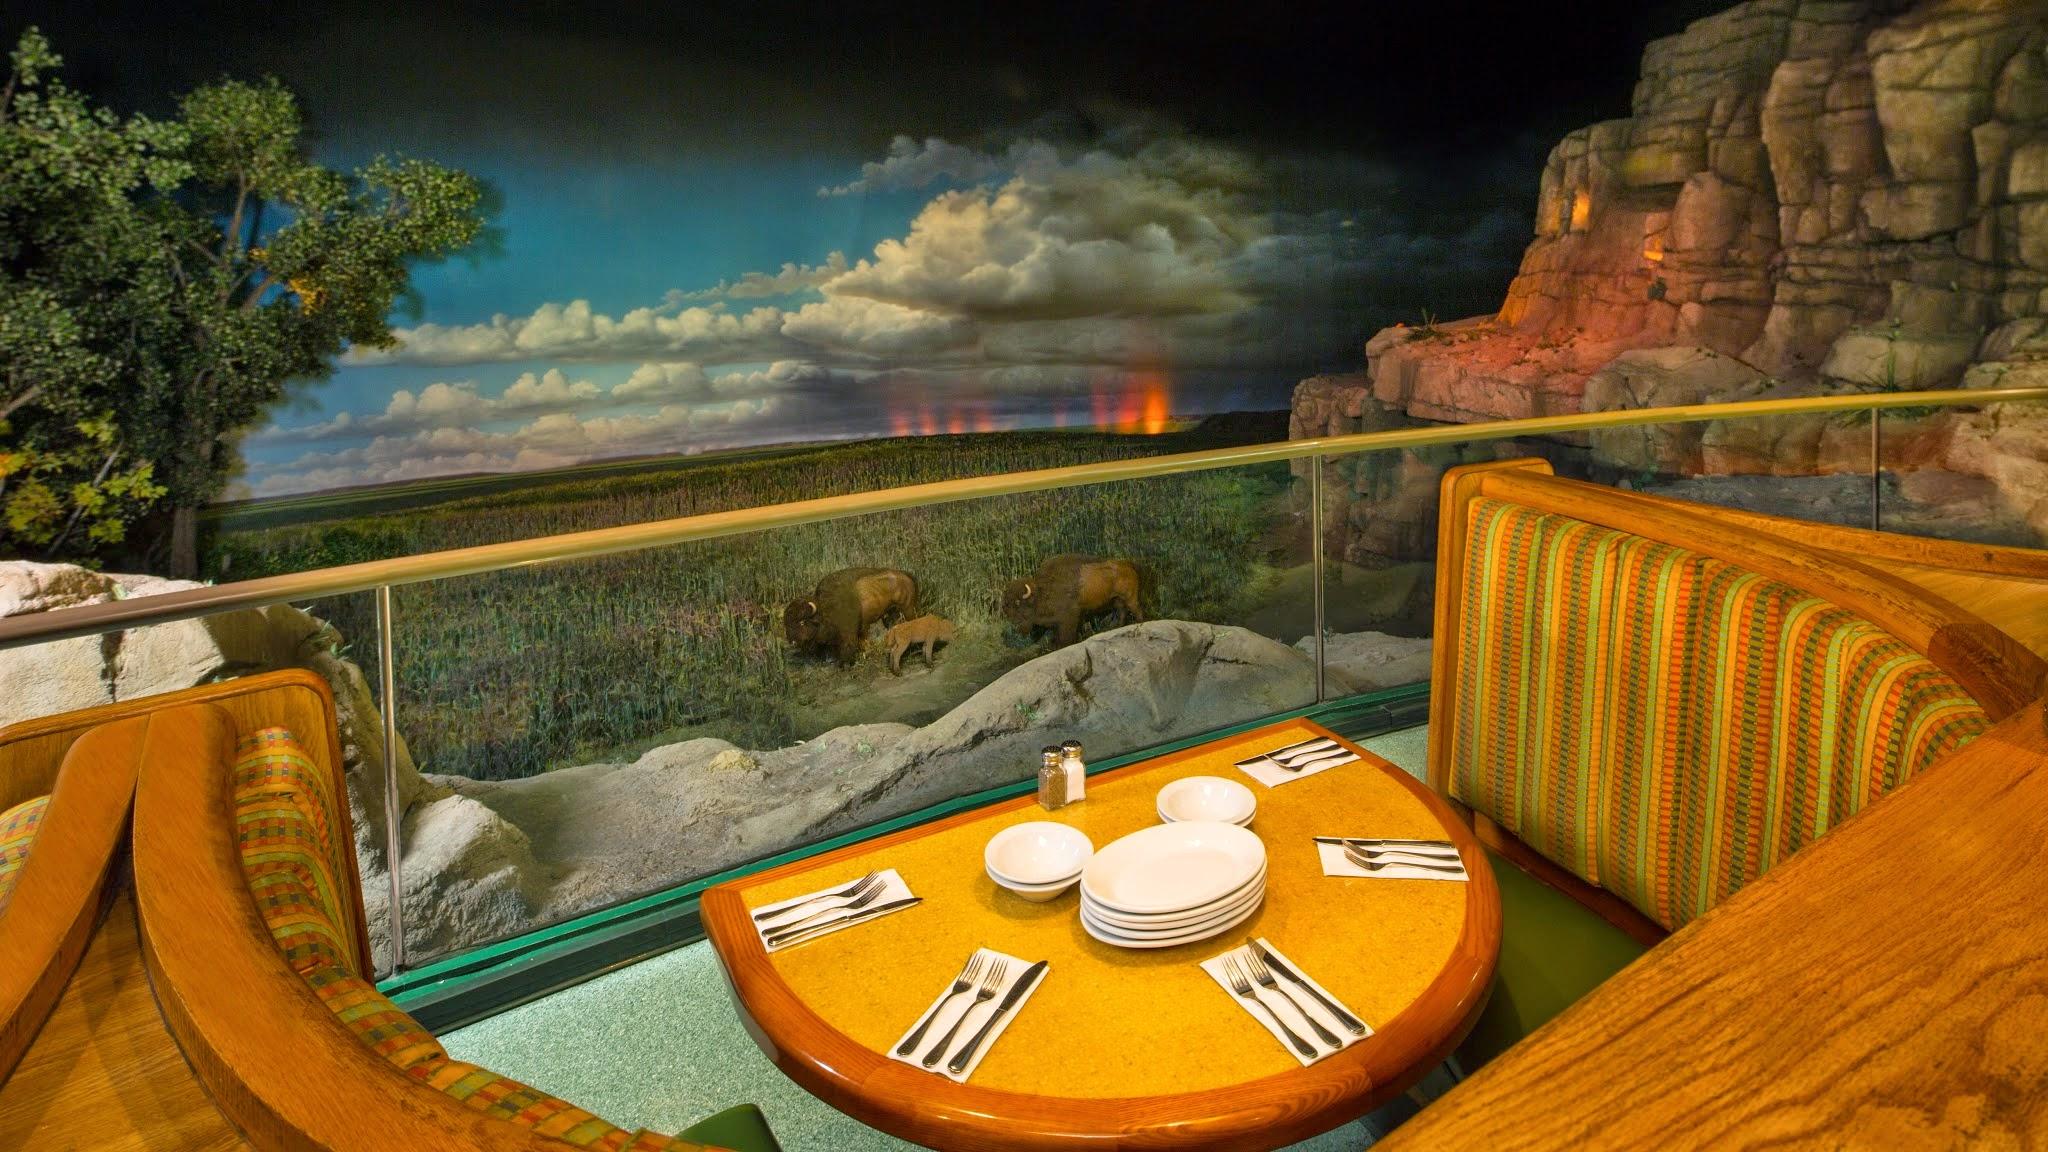 Garden Grill Restaurant - Google+